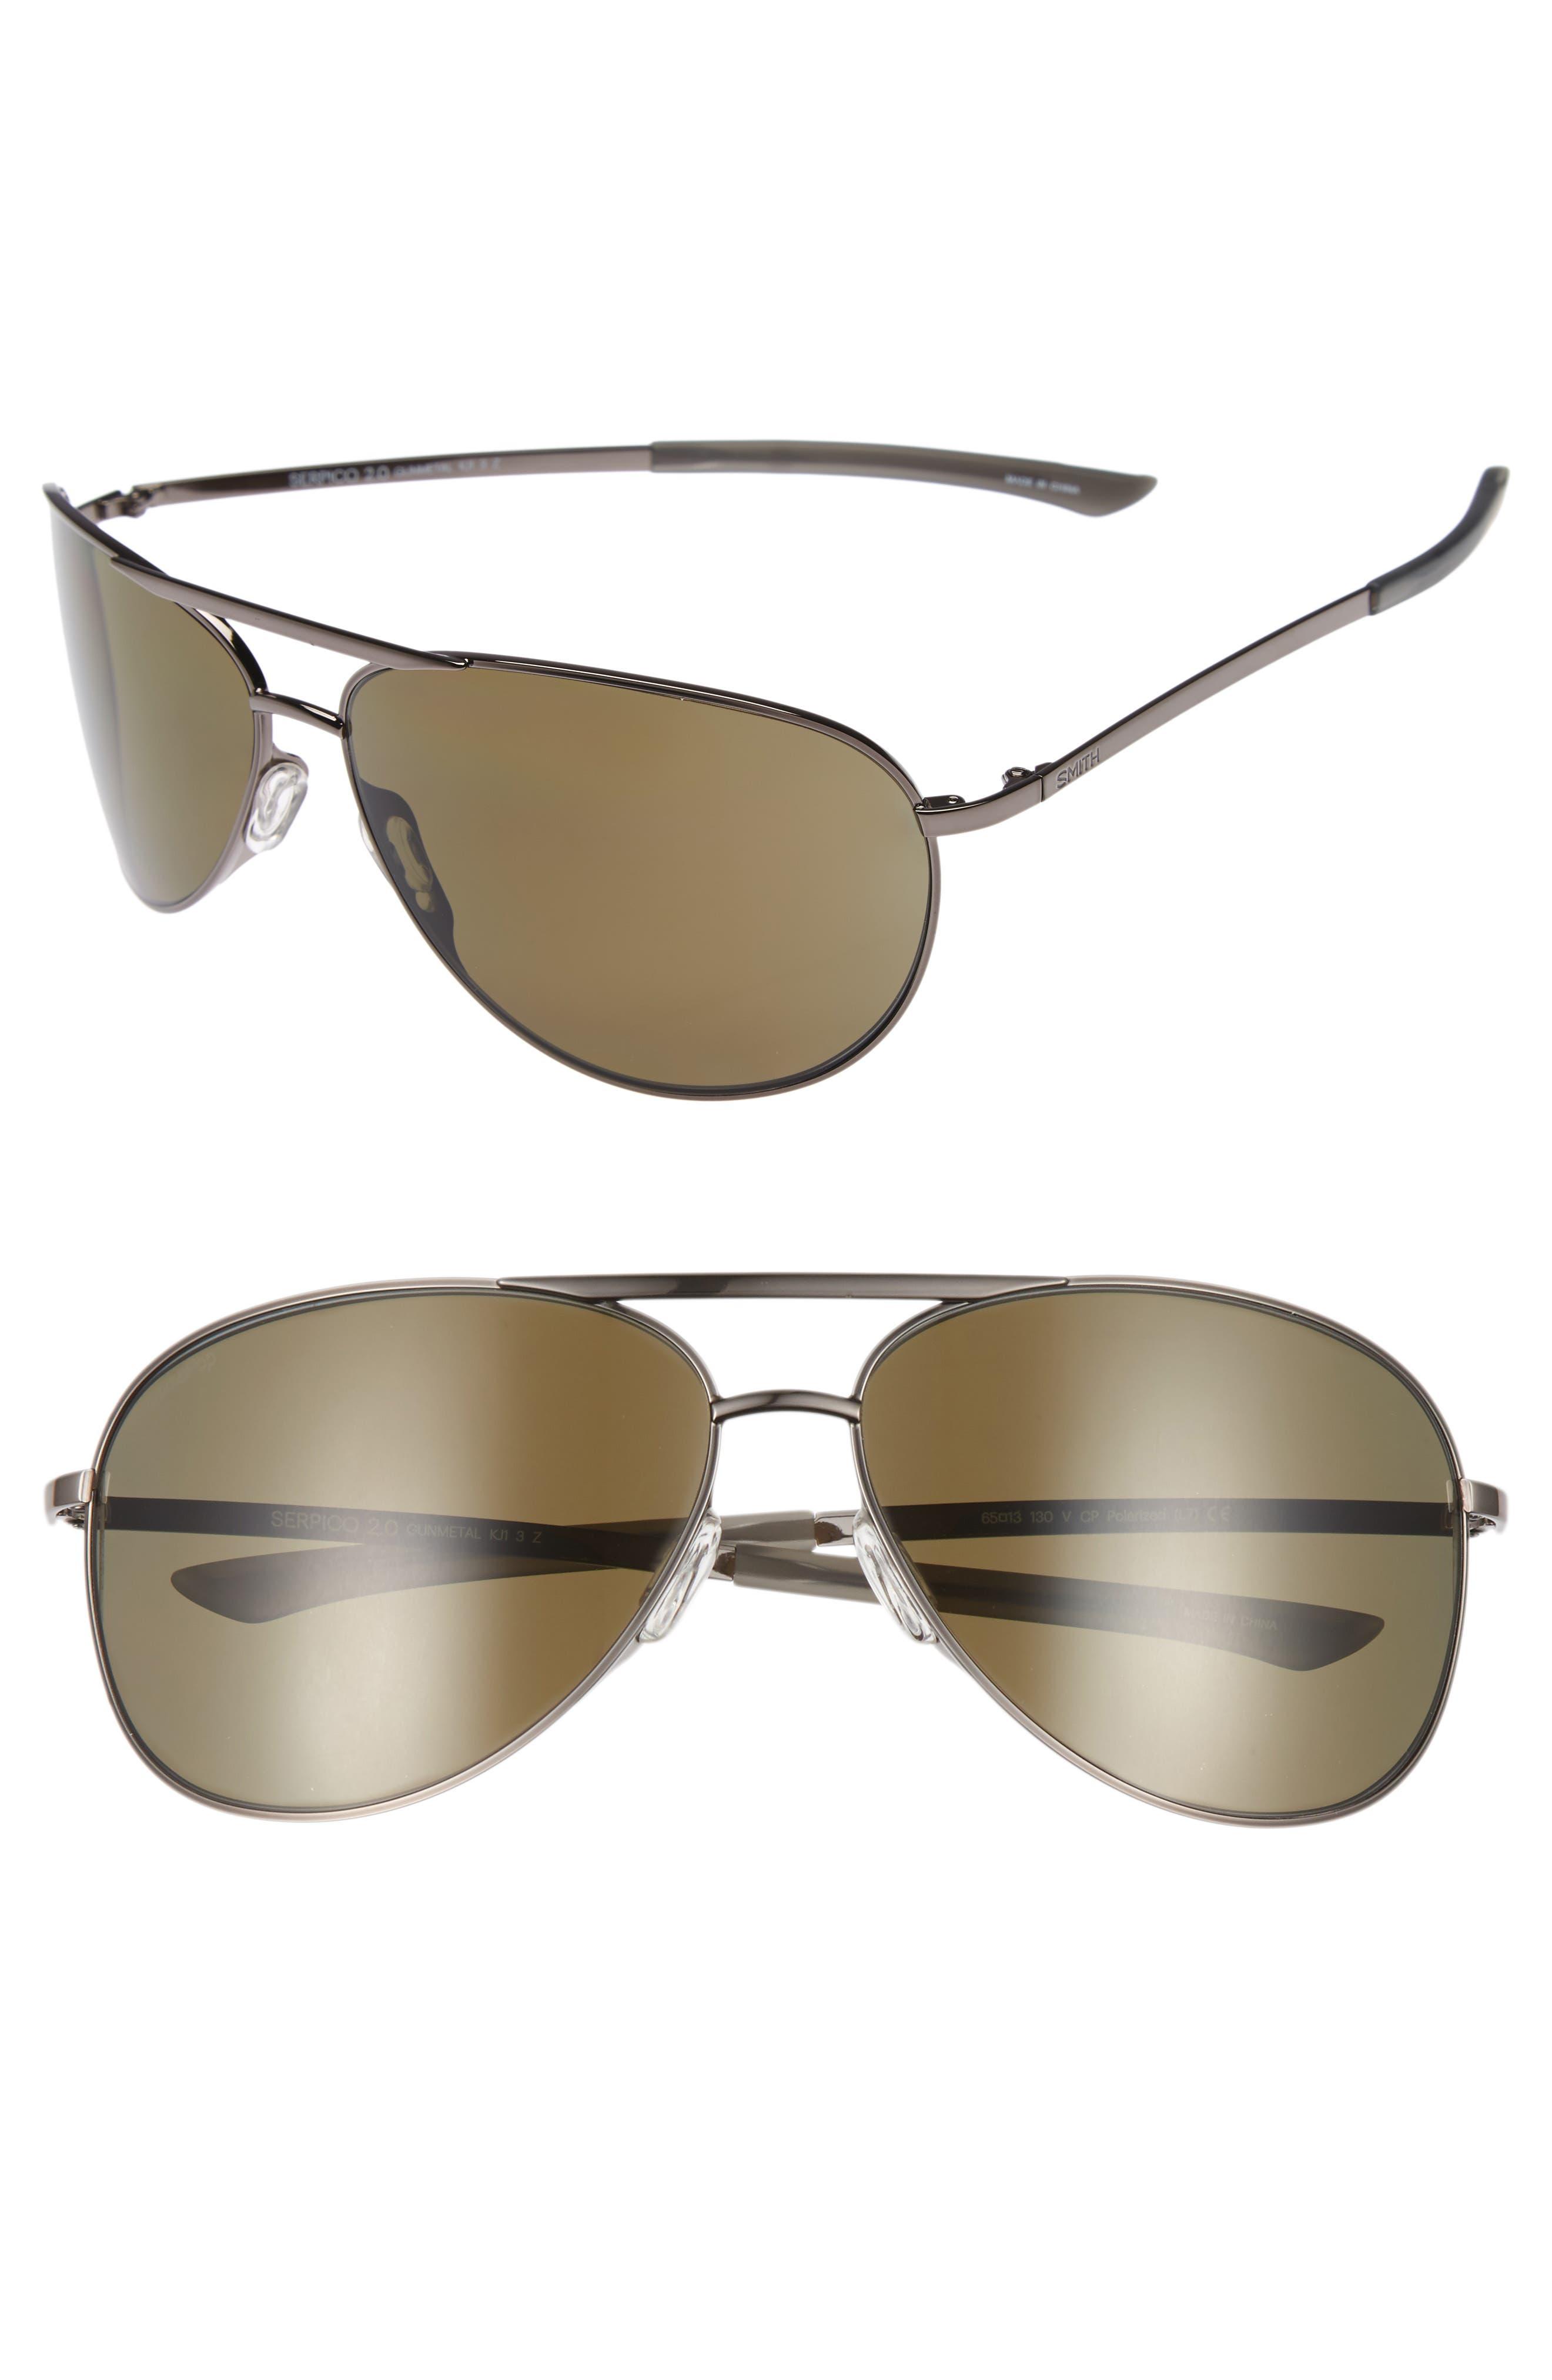 SMITH,                             Serpico Slim 2.0 65mm ChromaPop<sup>™</sup> Polarized Aviator Sunglasses,                             Main thumbnail 1, color,                             040